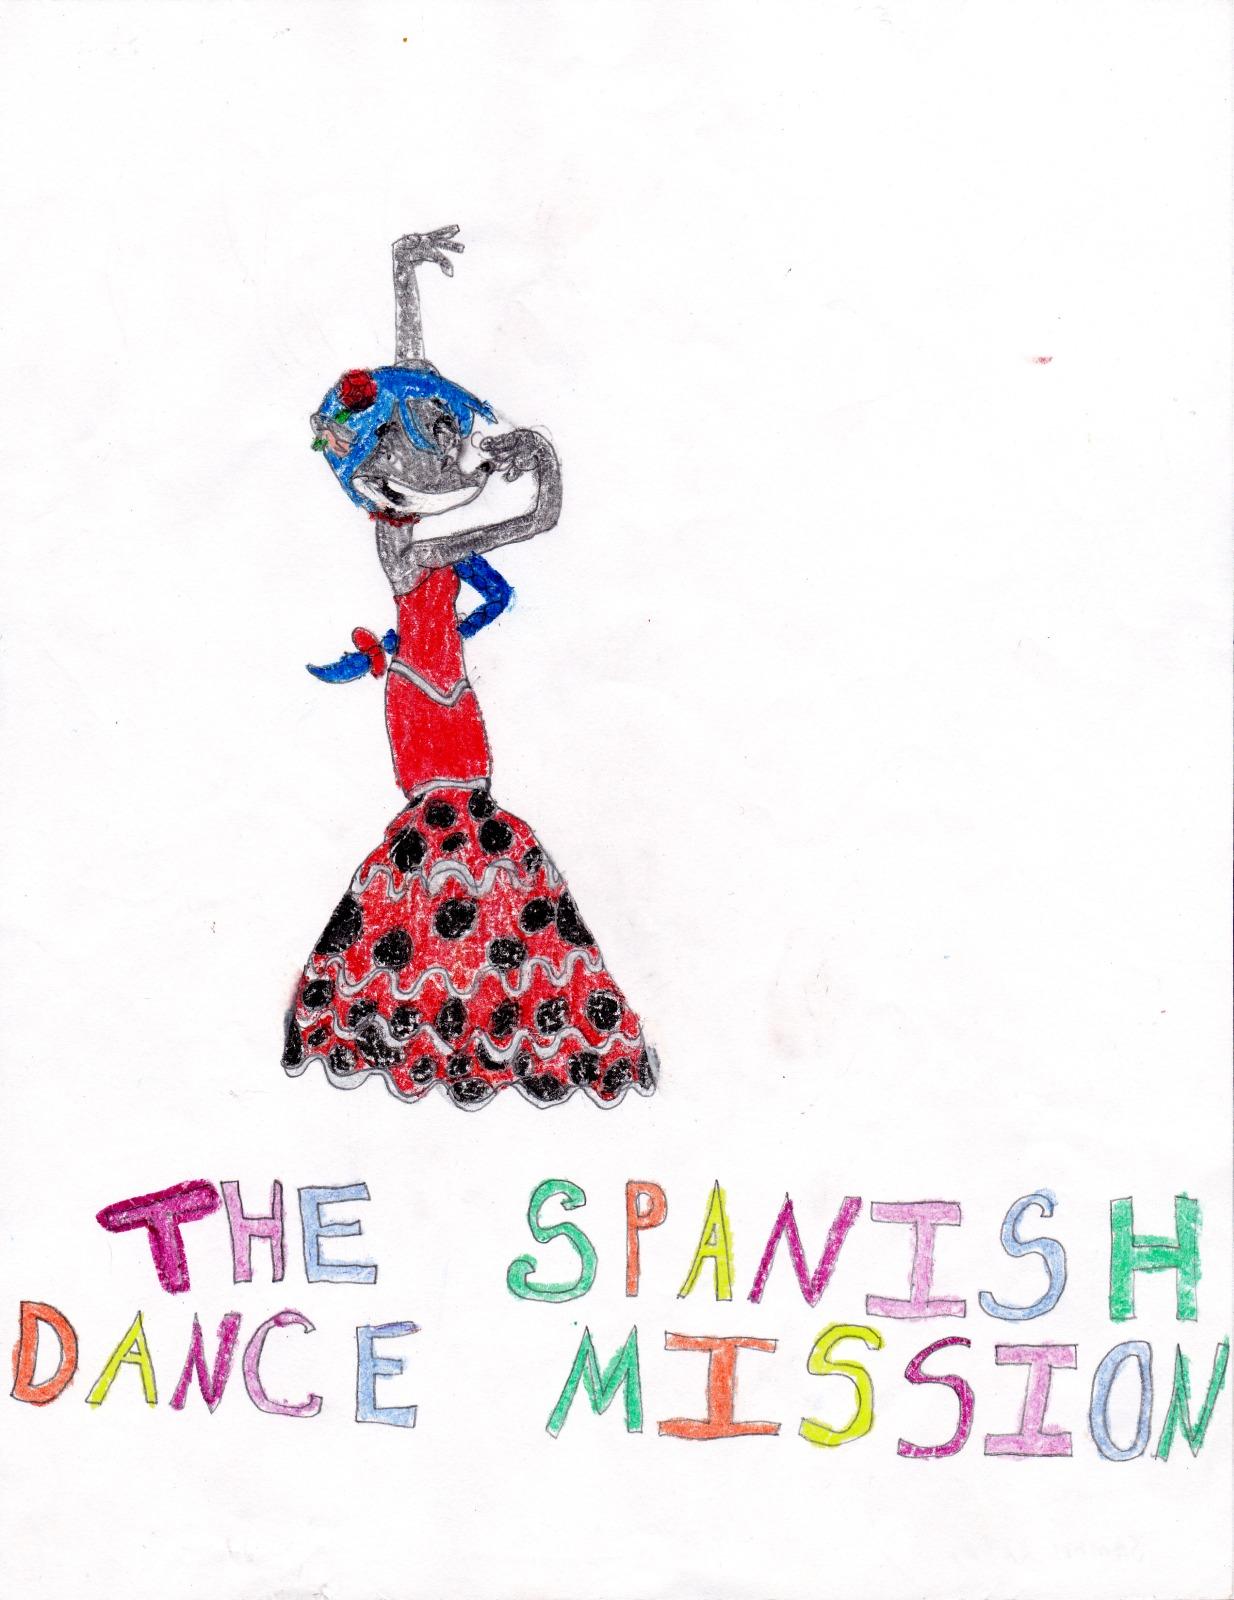 Paulina Stilton ‐ Spanish Dance Mission, artwork by Sammi Katri